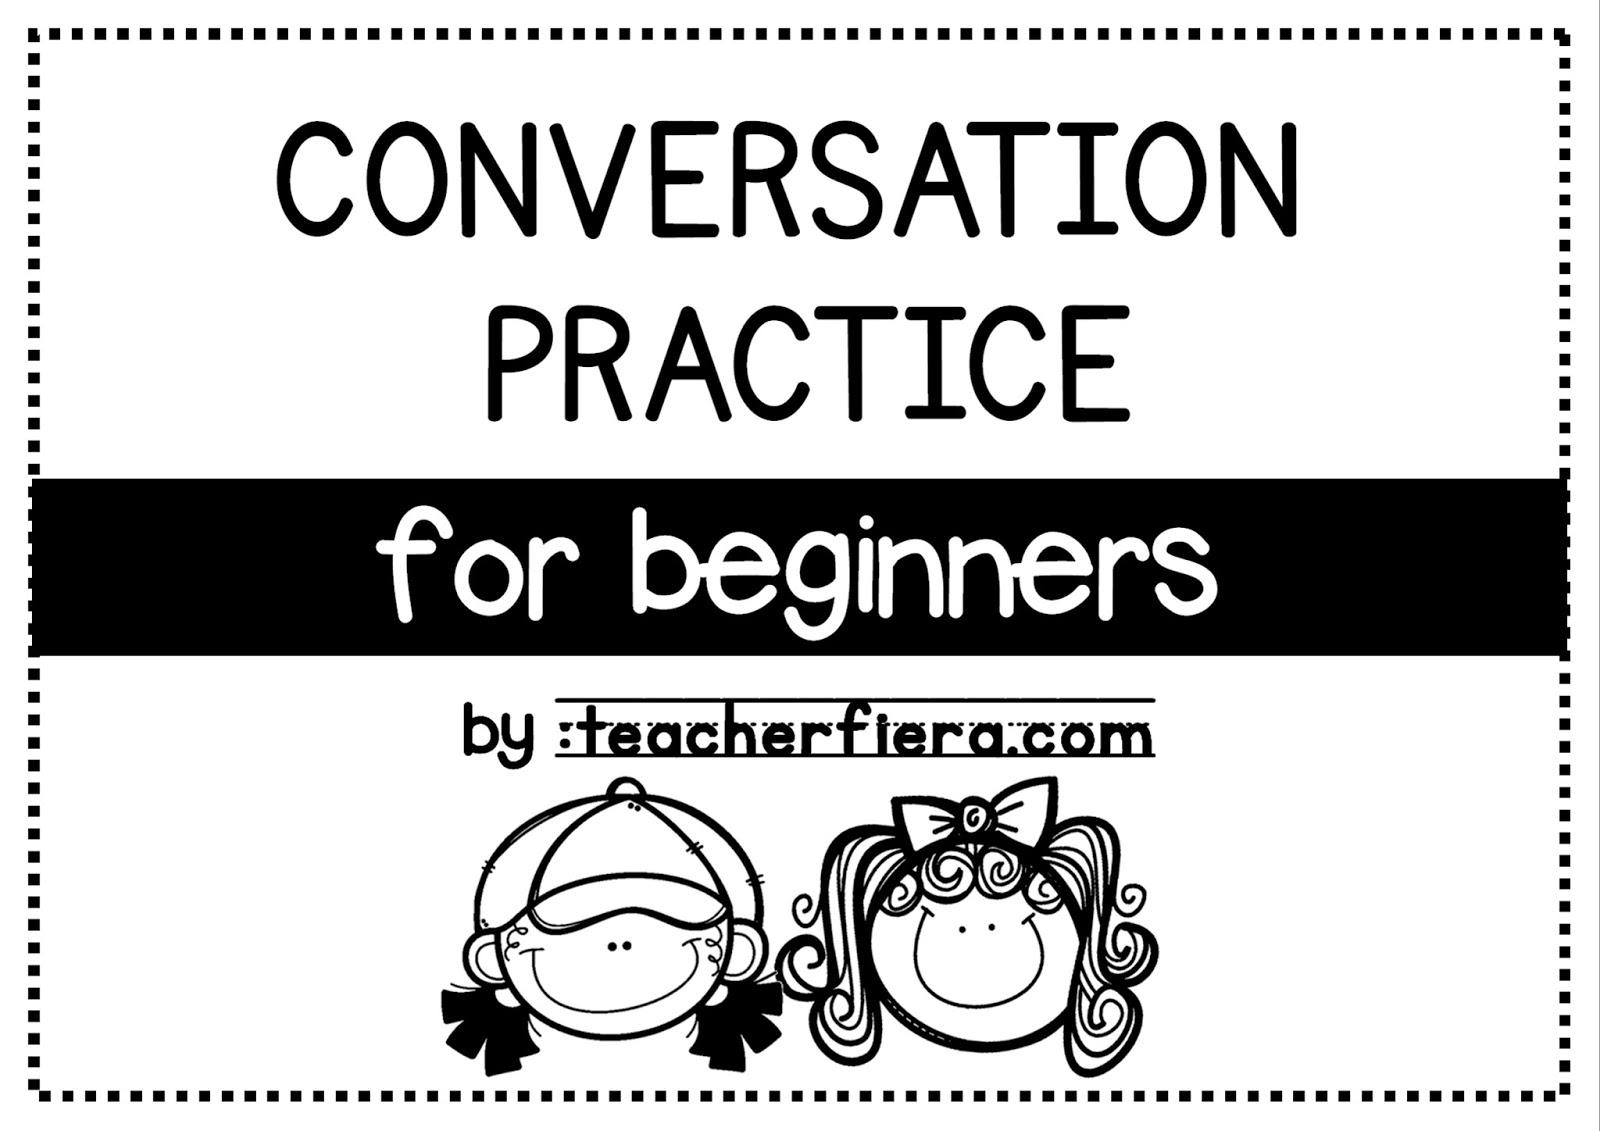 teacherfiera com: CONVERSATION PRACTICE FOR BEGINNERS